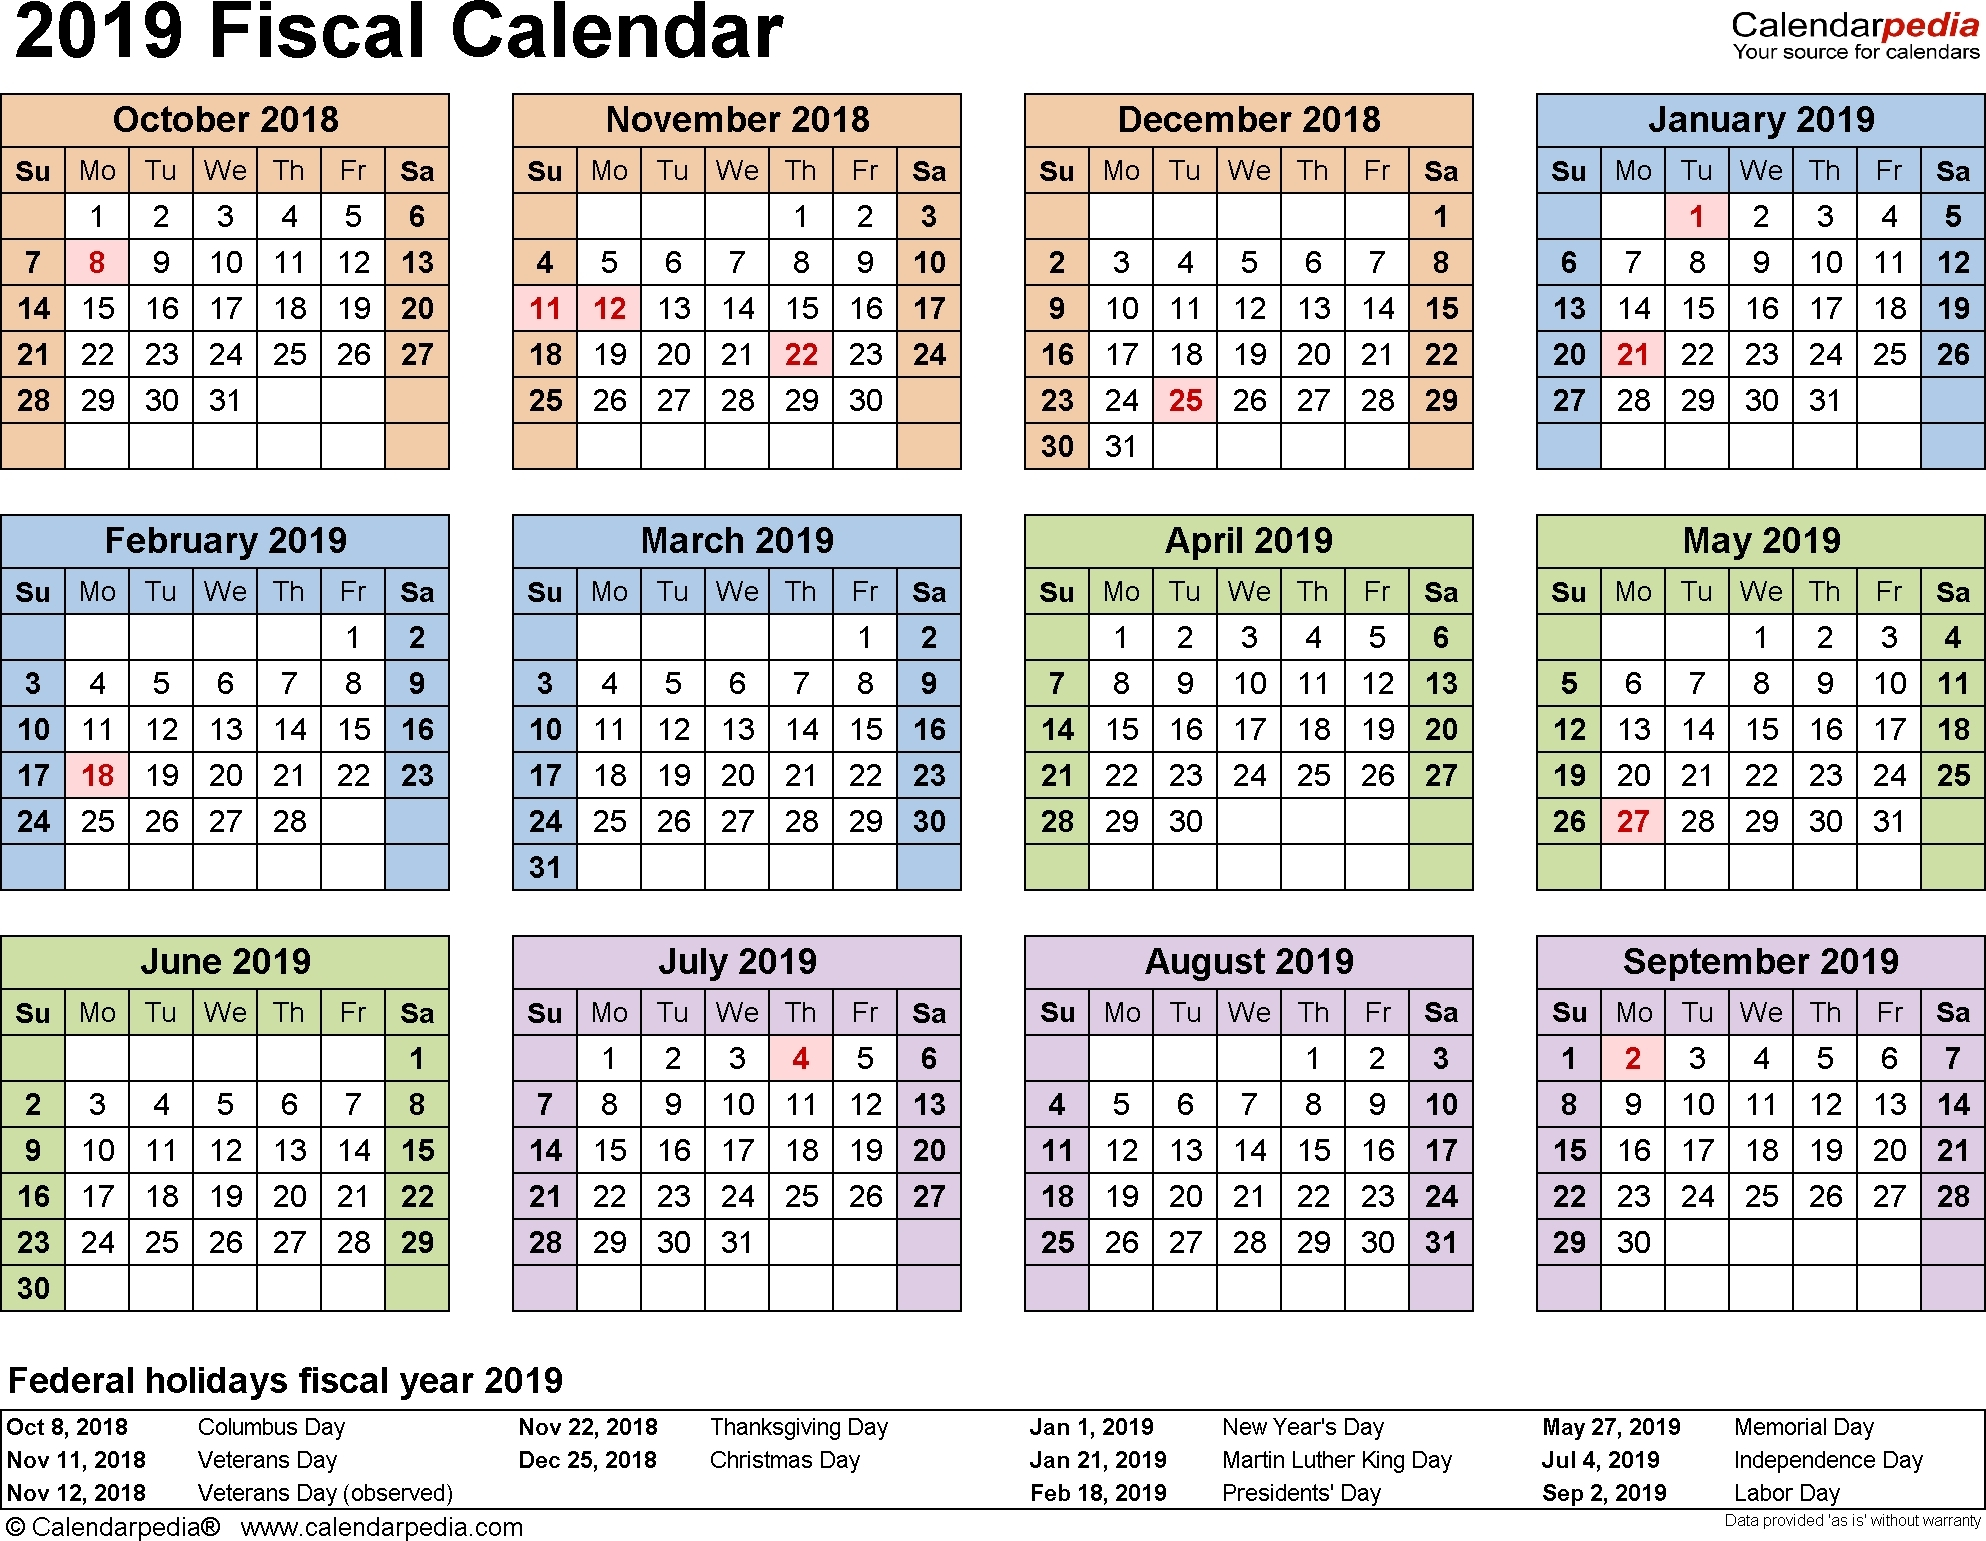 Medroxyprogesterone Perpetual Calendar 12-14 Weeks - Calendar Inspiration Design